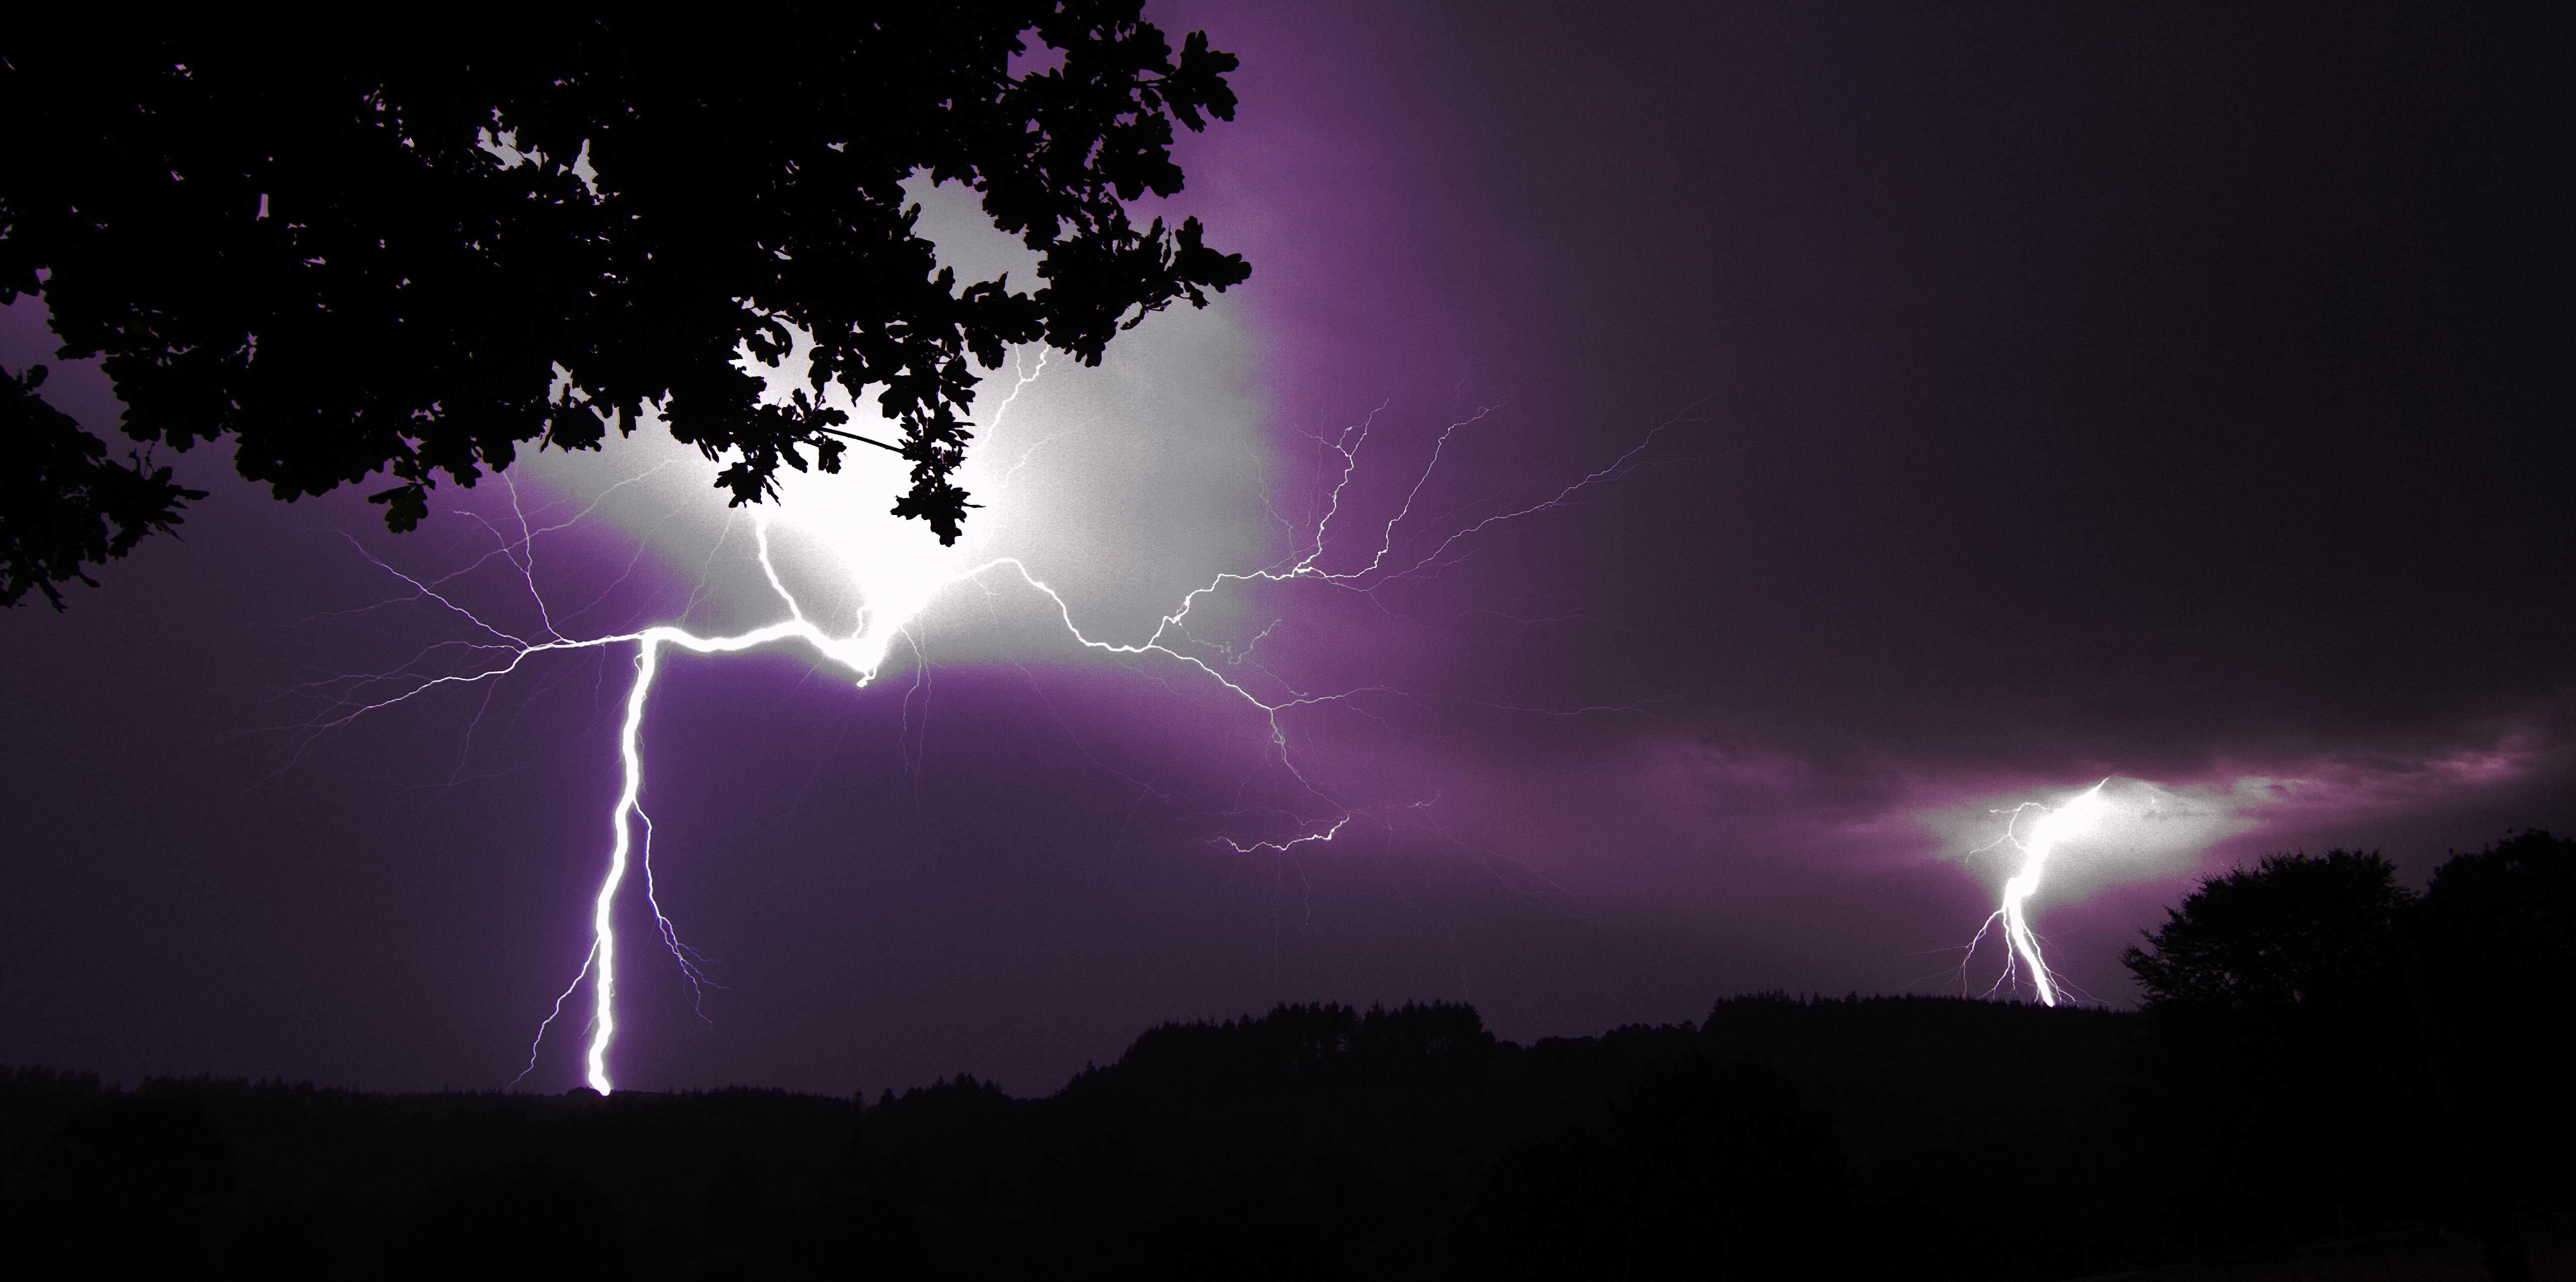 Lightning in purple sky 4k ultra hd wallpaper background image 5172x2574 id 774028 - Lightning wallpaper 4k ...